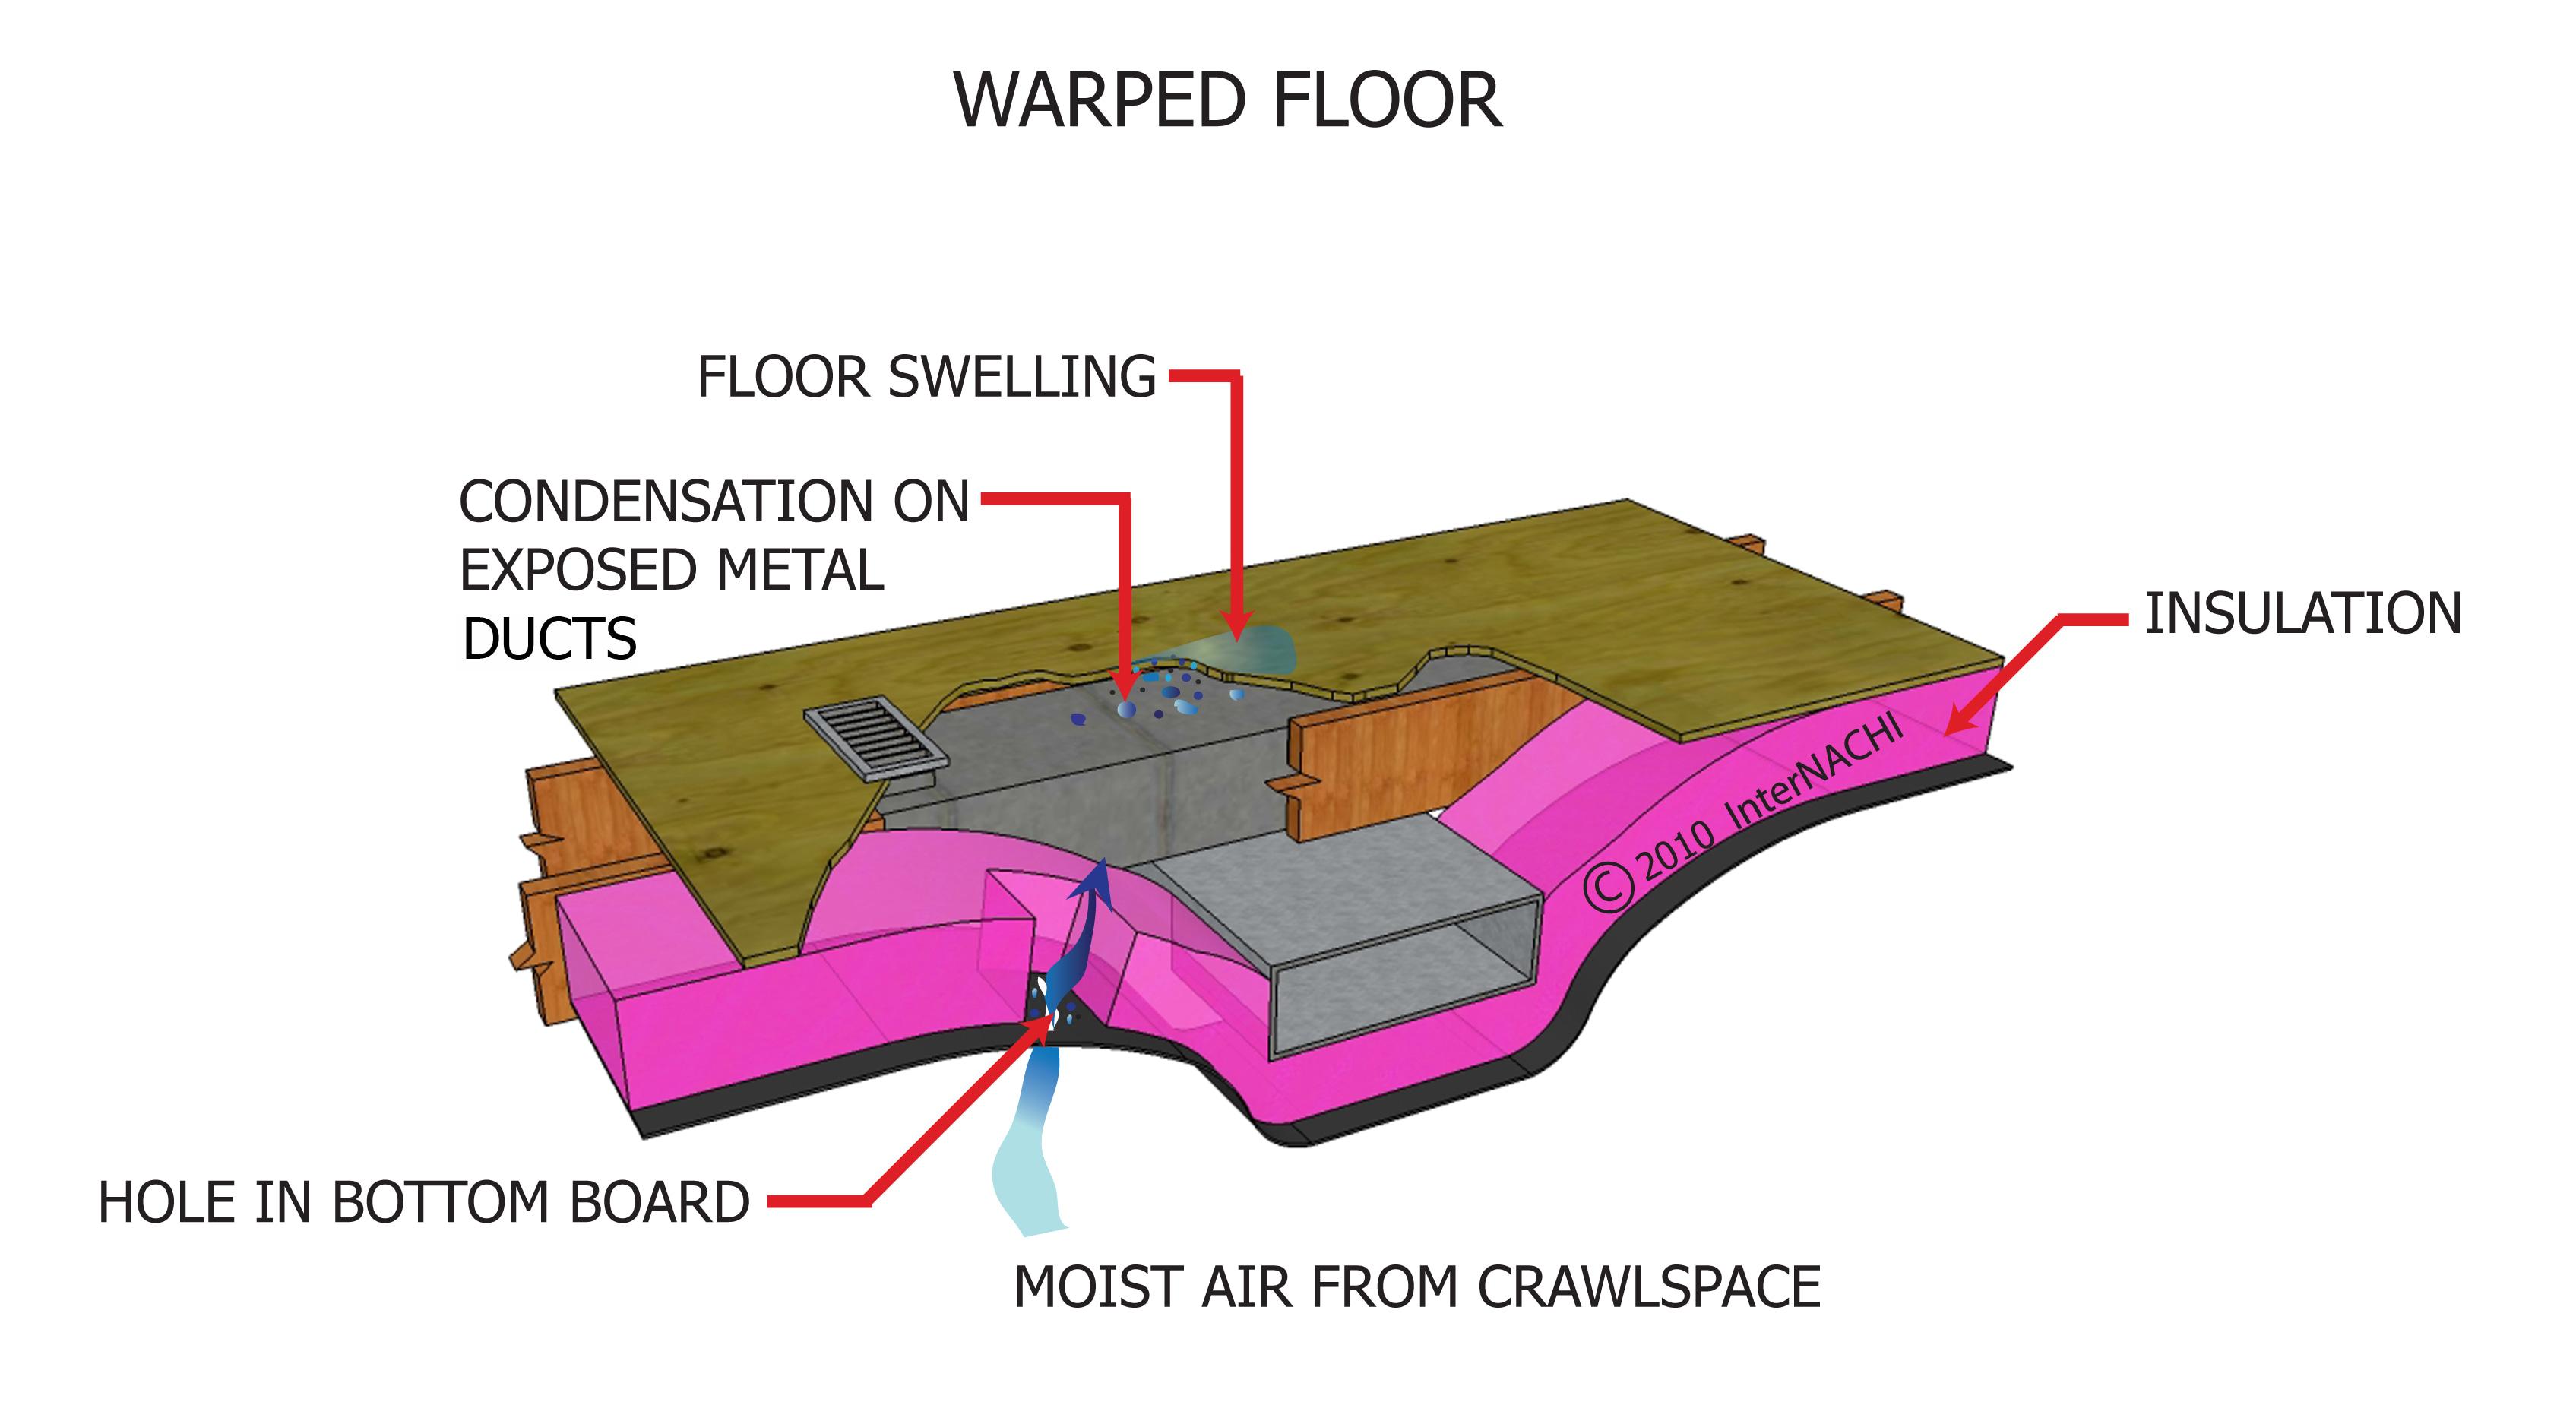 Warped floor.